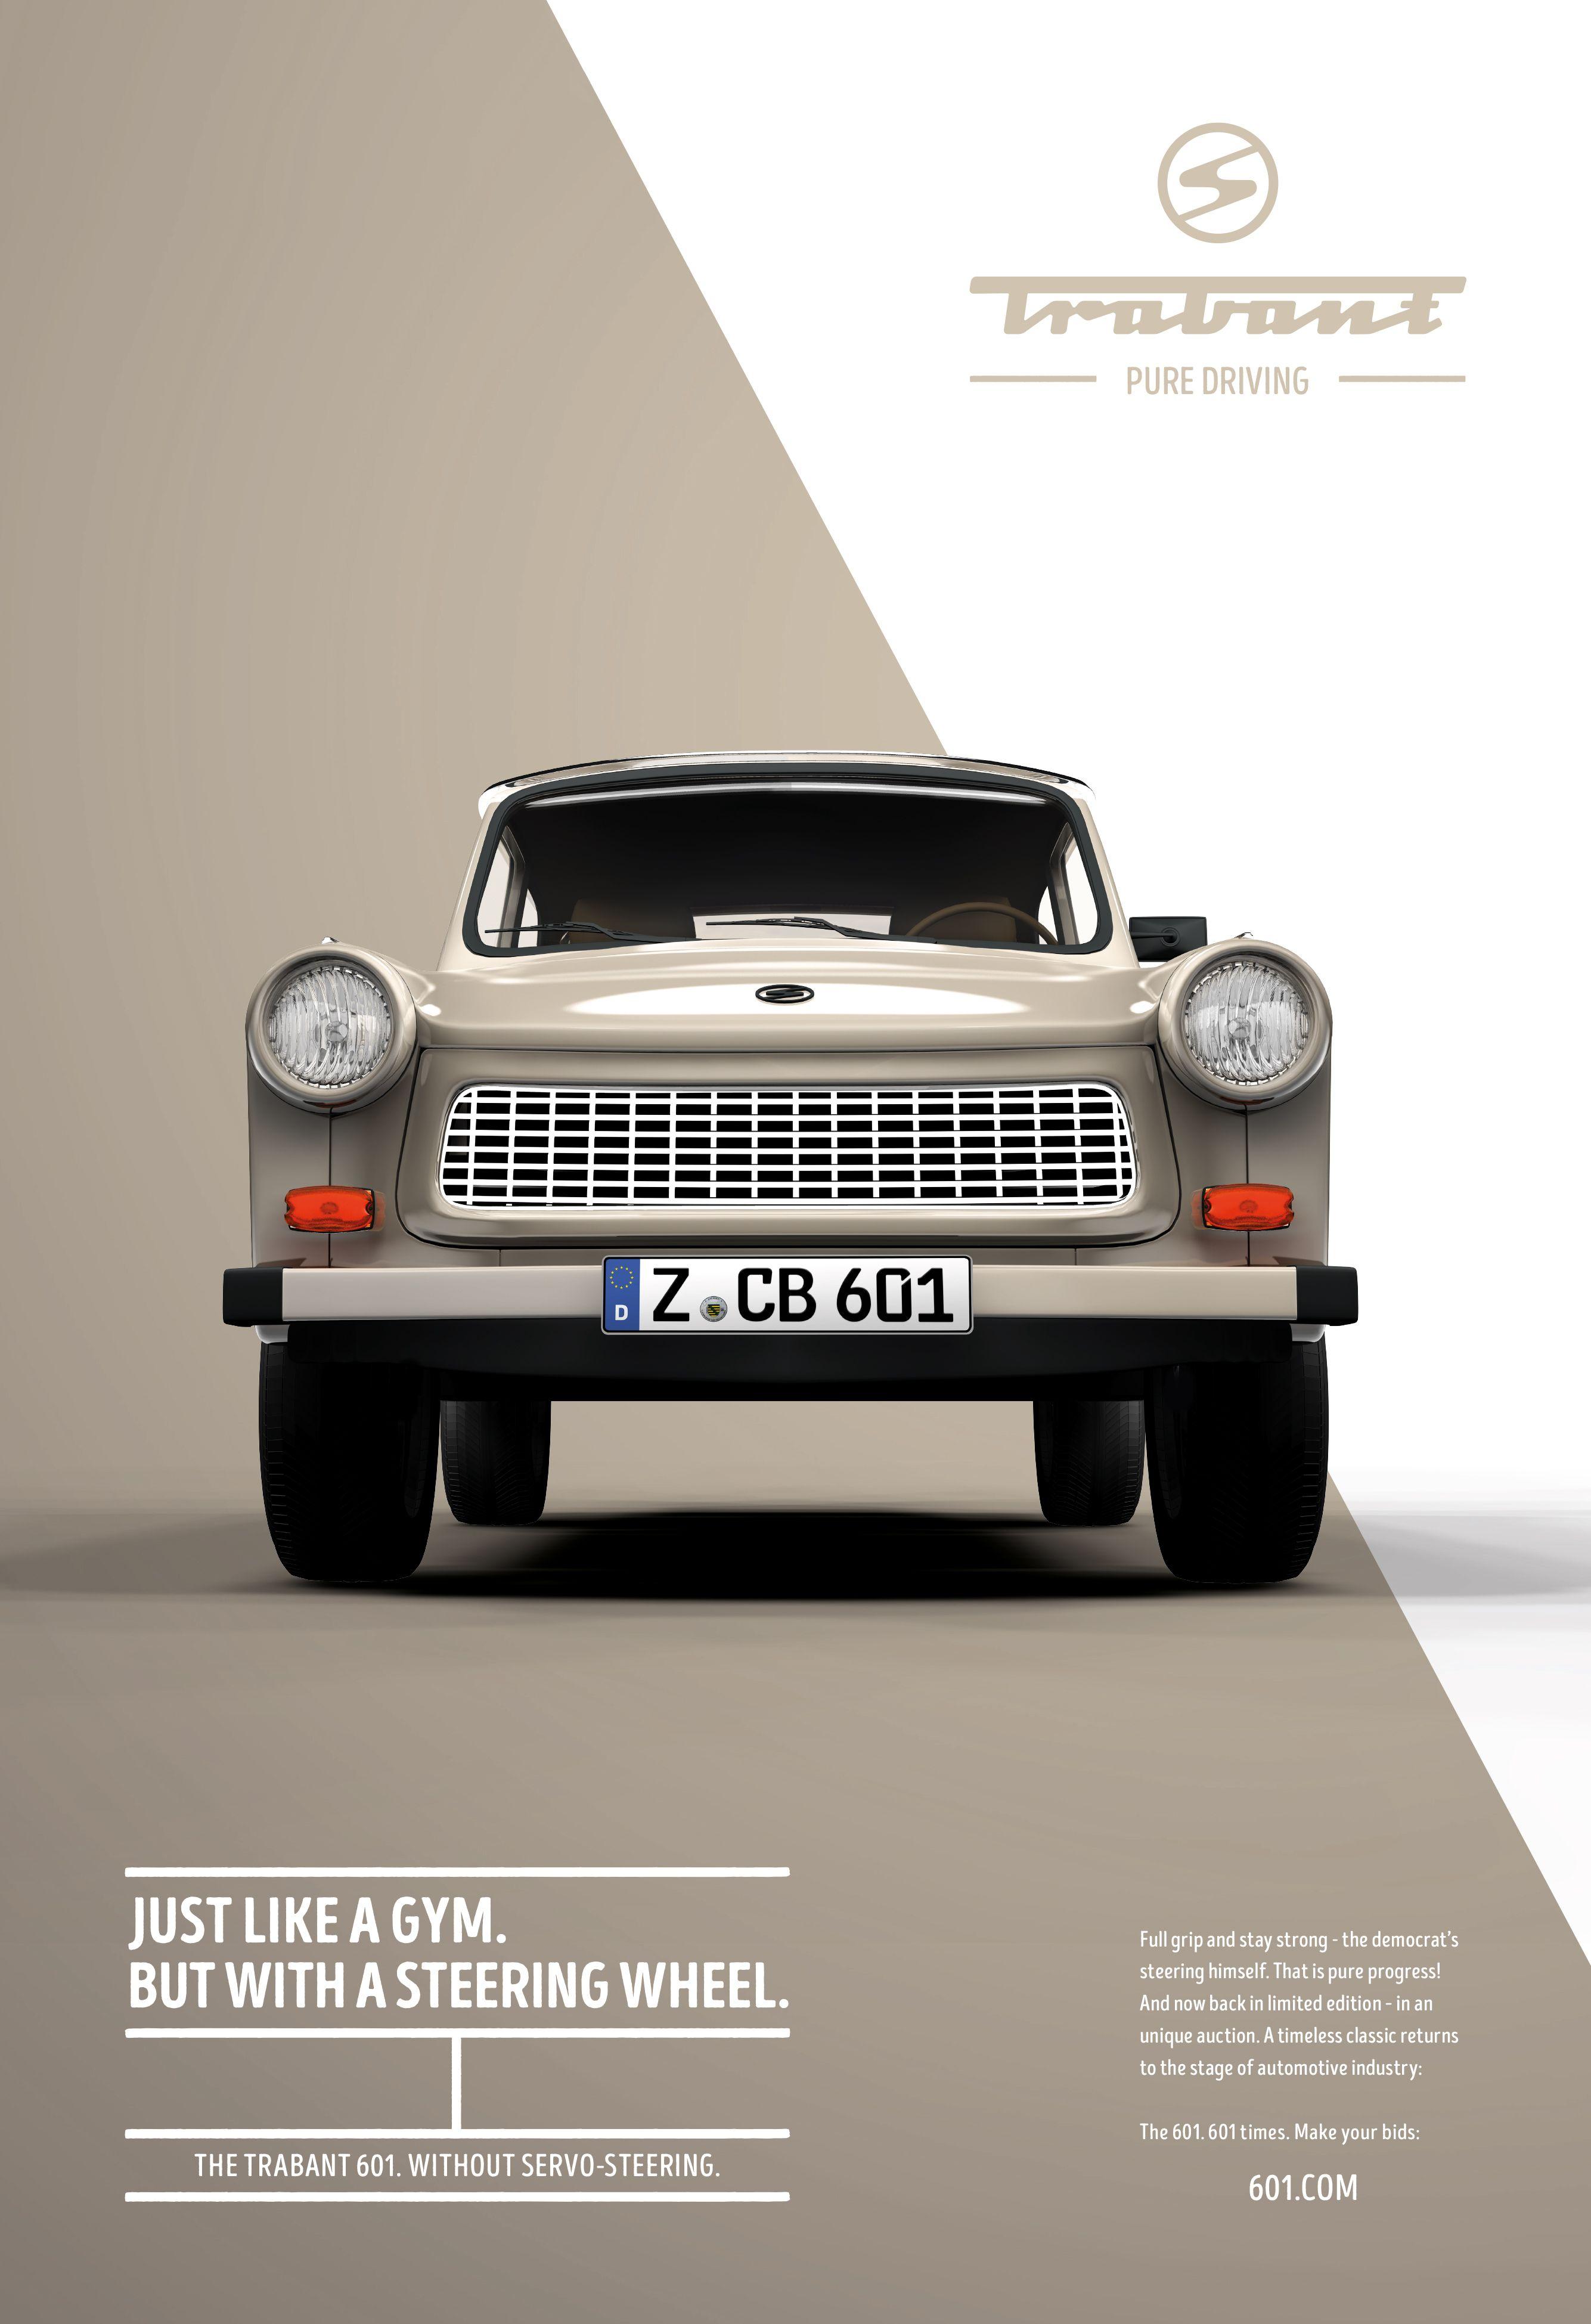 trabant-601-pure-driving-outdoor-print-377371-adeevee.jpg (2669×3898)